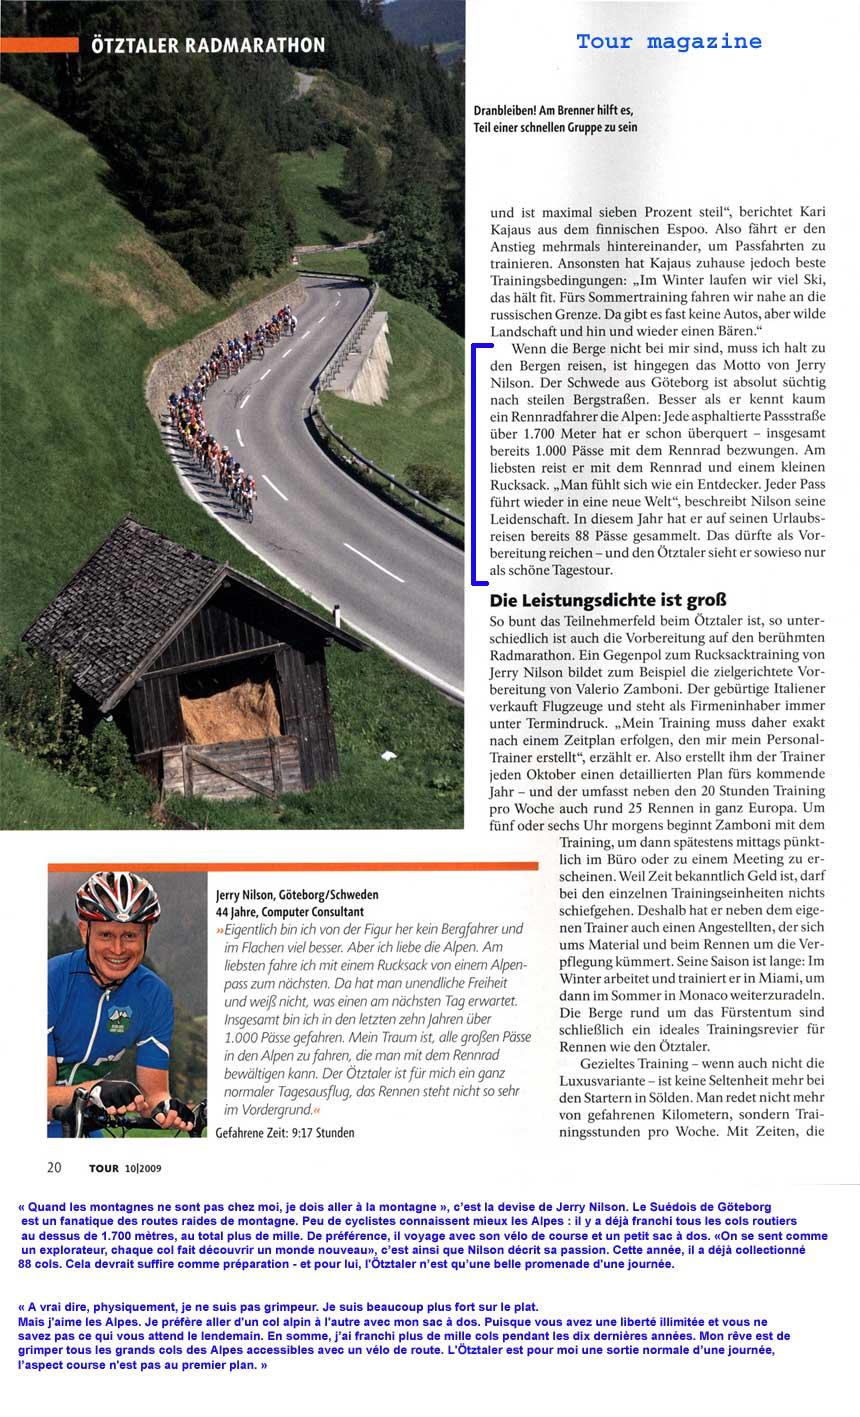 Tour-magazine-oct-2009